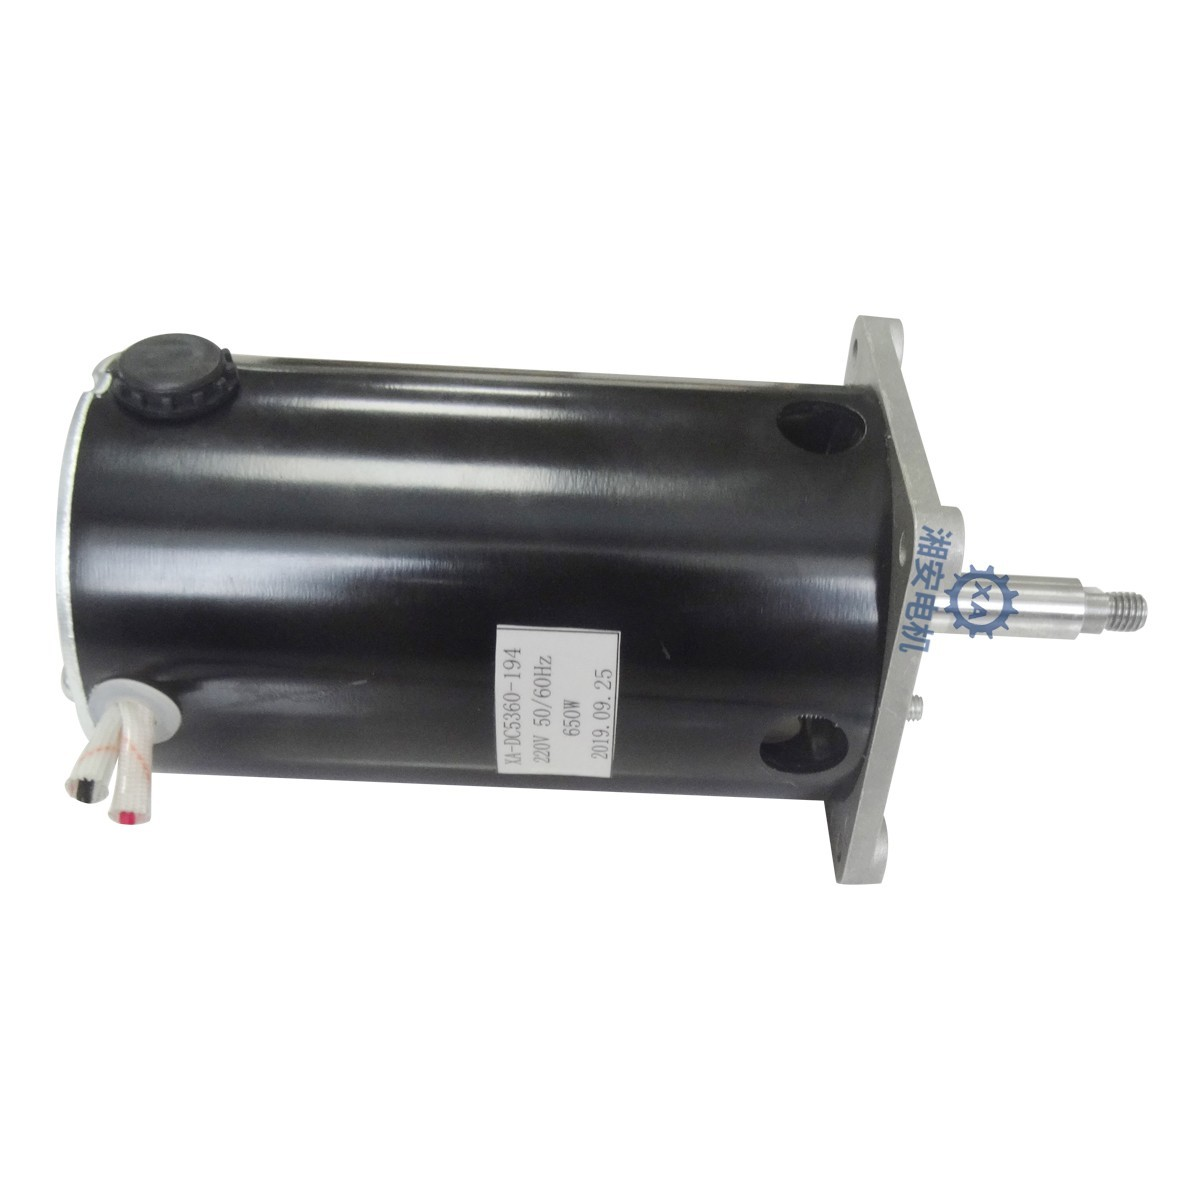 DC5350M22